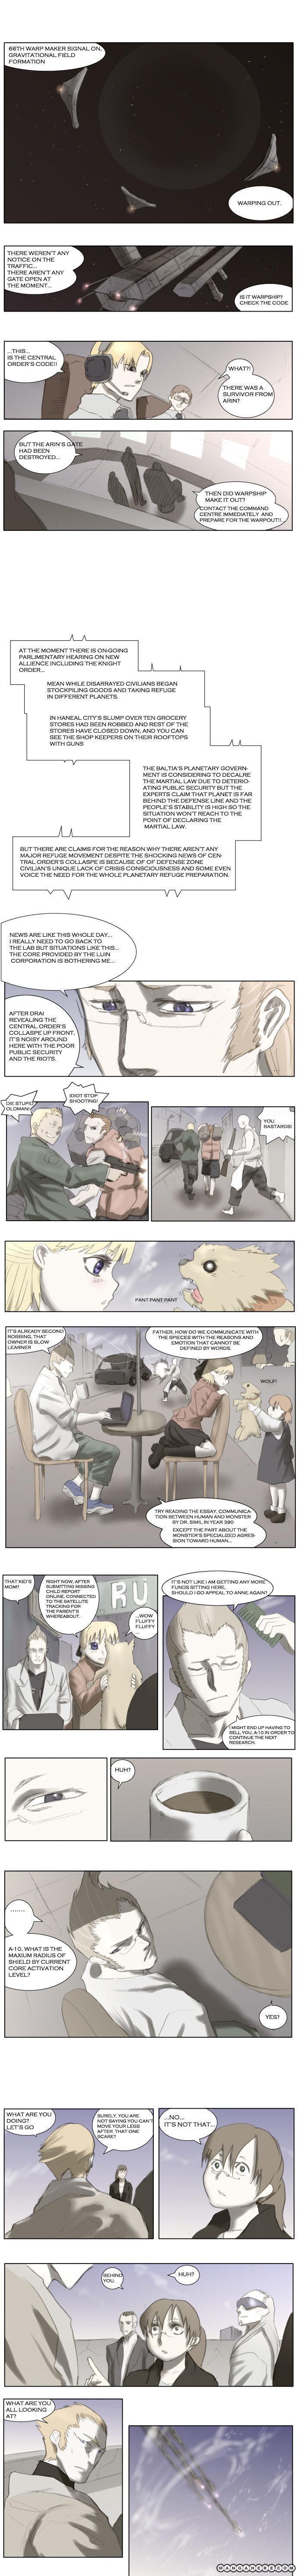 Knight Run 17 Page 1